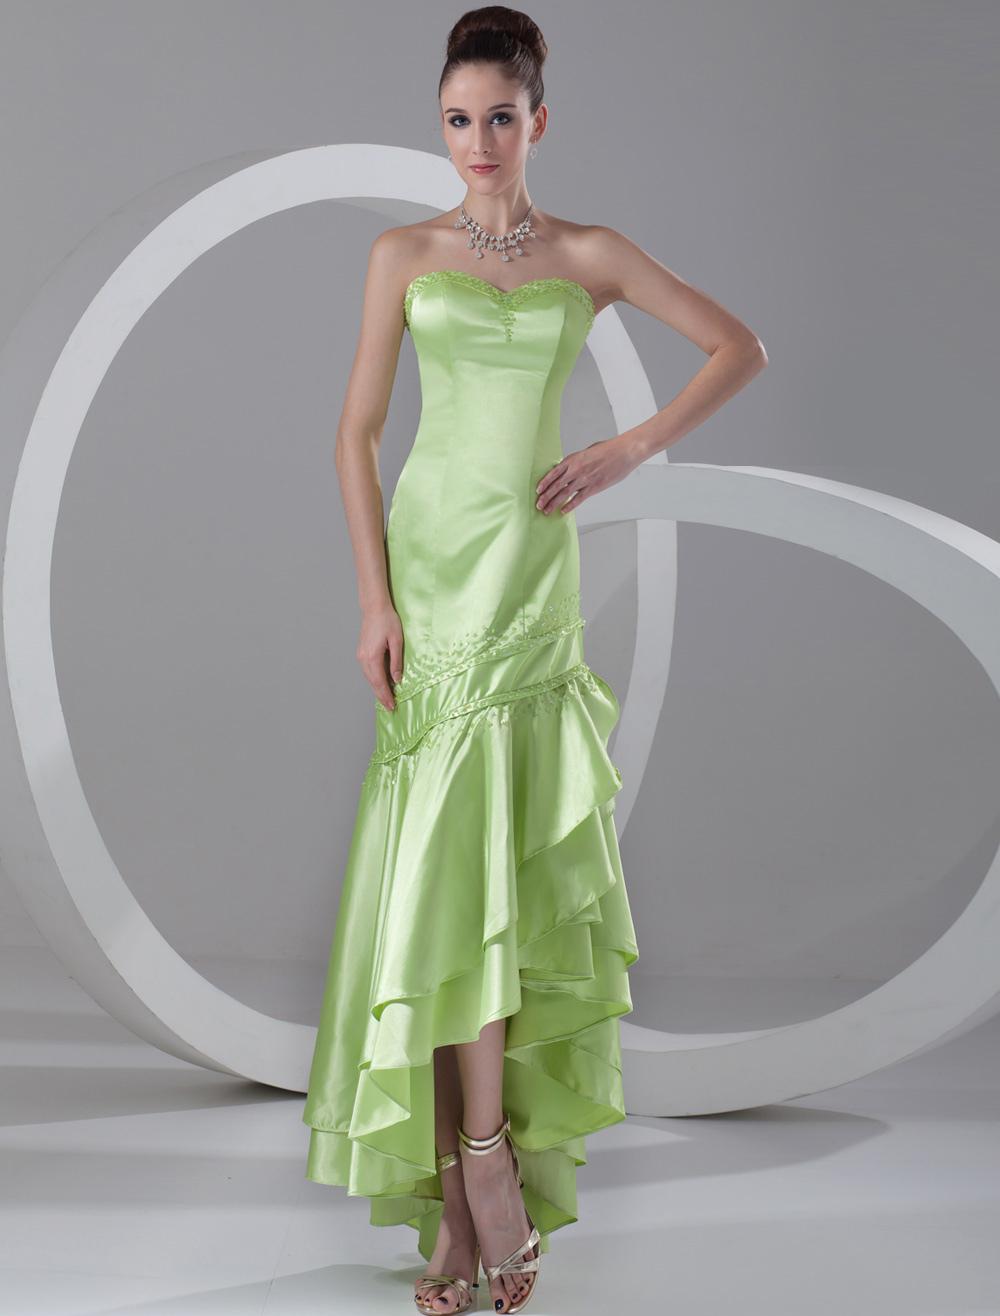 Sweetheart Evening Dress Neon Green Sequin Strapless Mermaid Prom Dress High Low Ruffle Tiered Formal Dress (Wedding Evening Dresses) photo